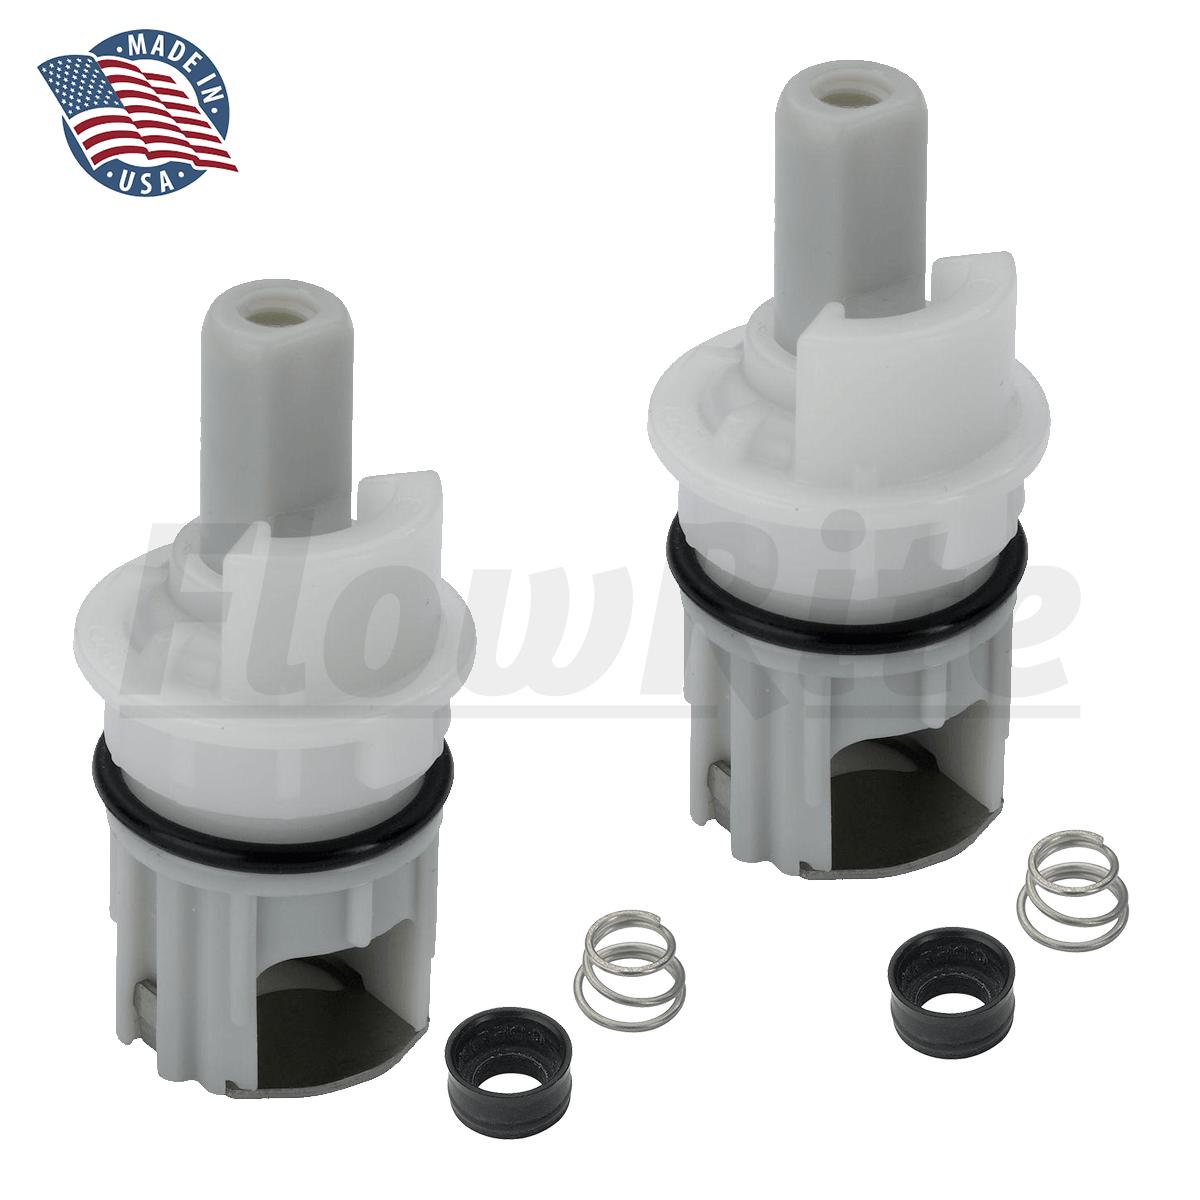 flowrite stem kit for delta faucet rp1740 two handle faucet repair 2 pack